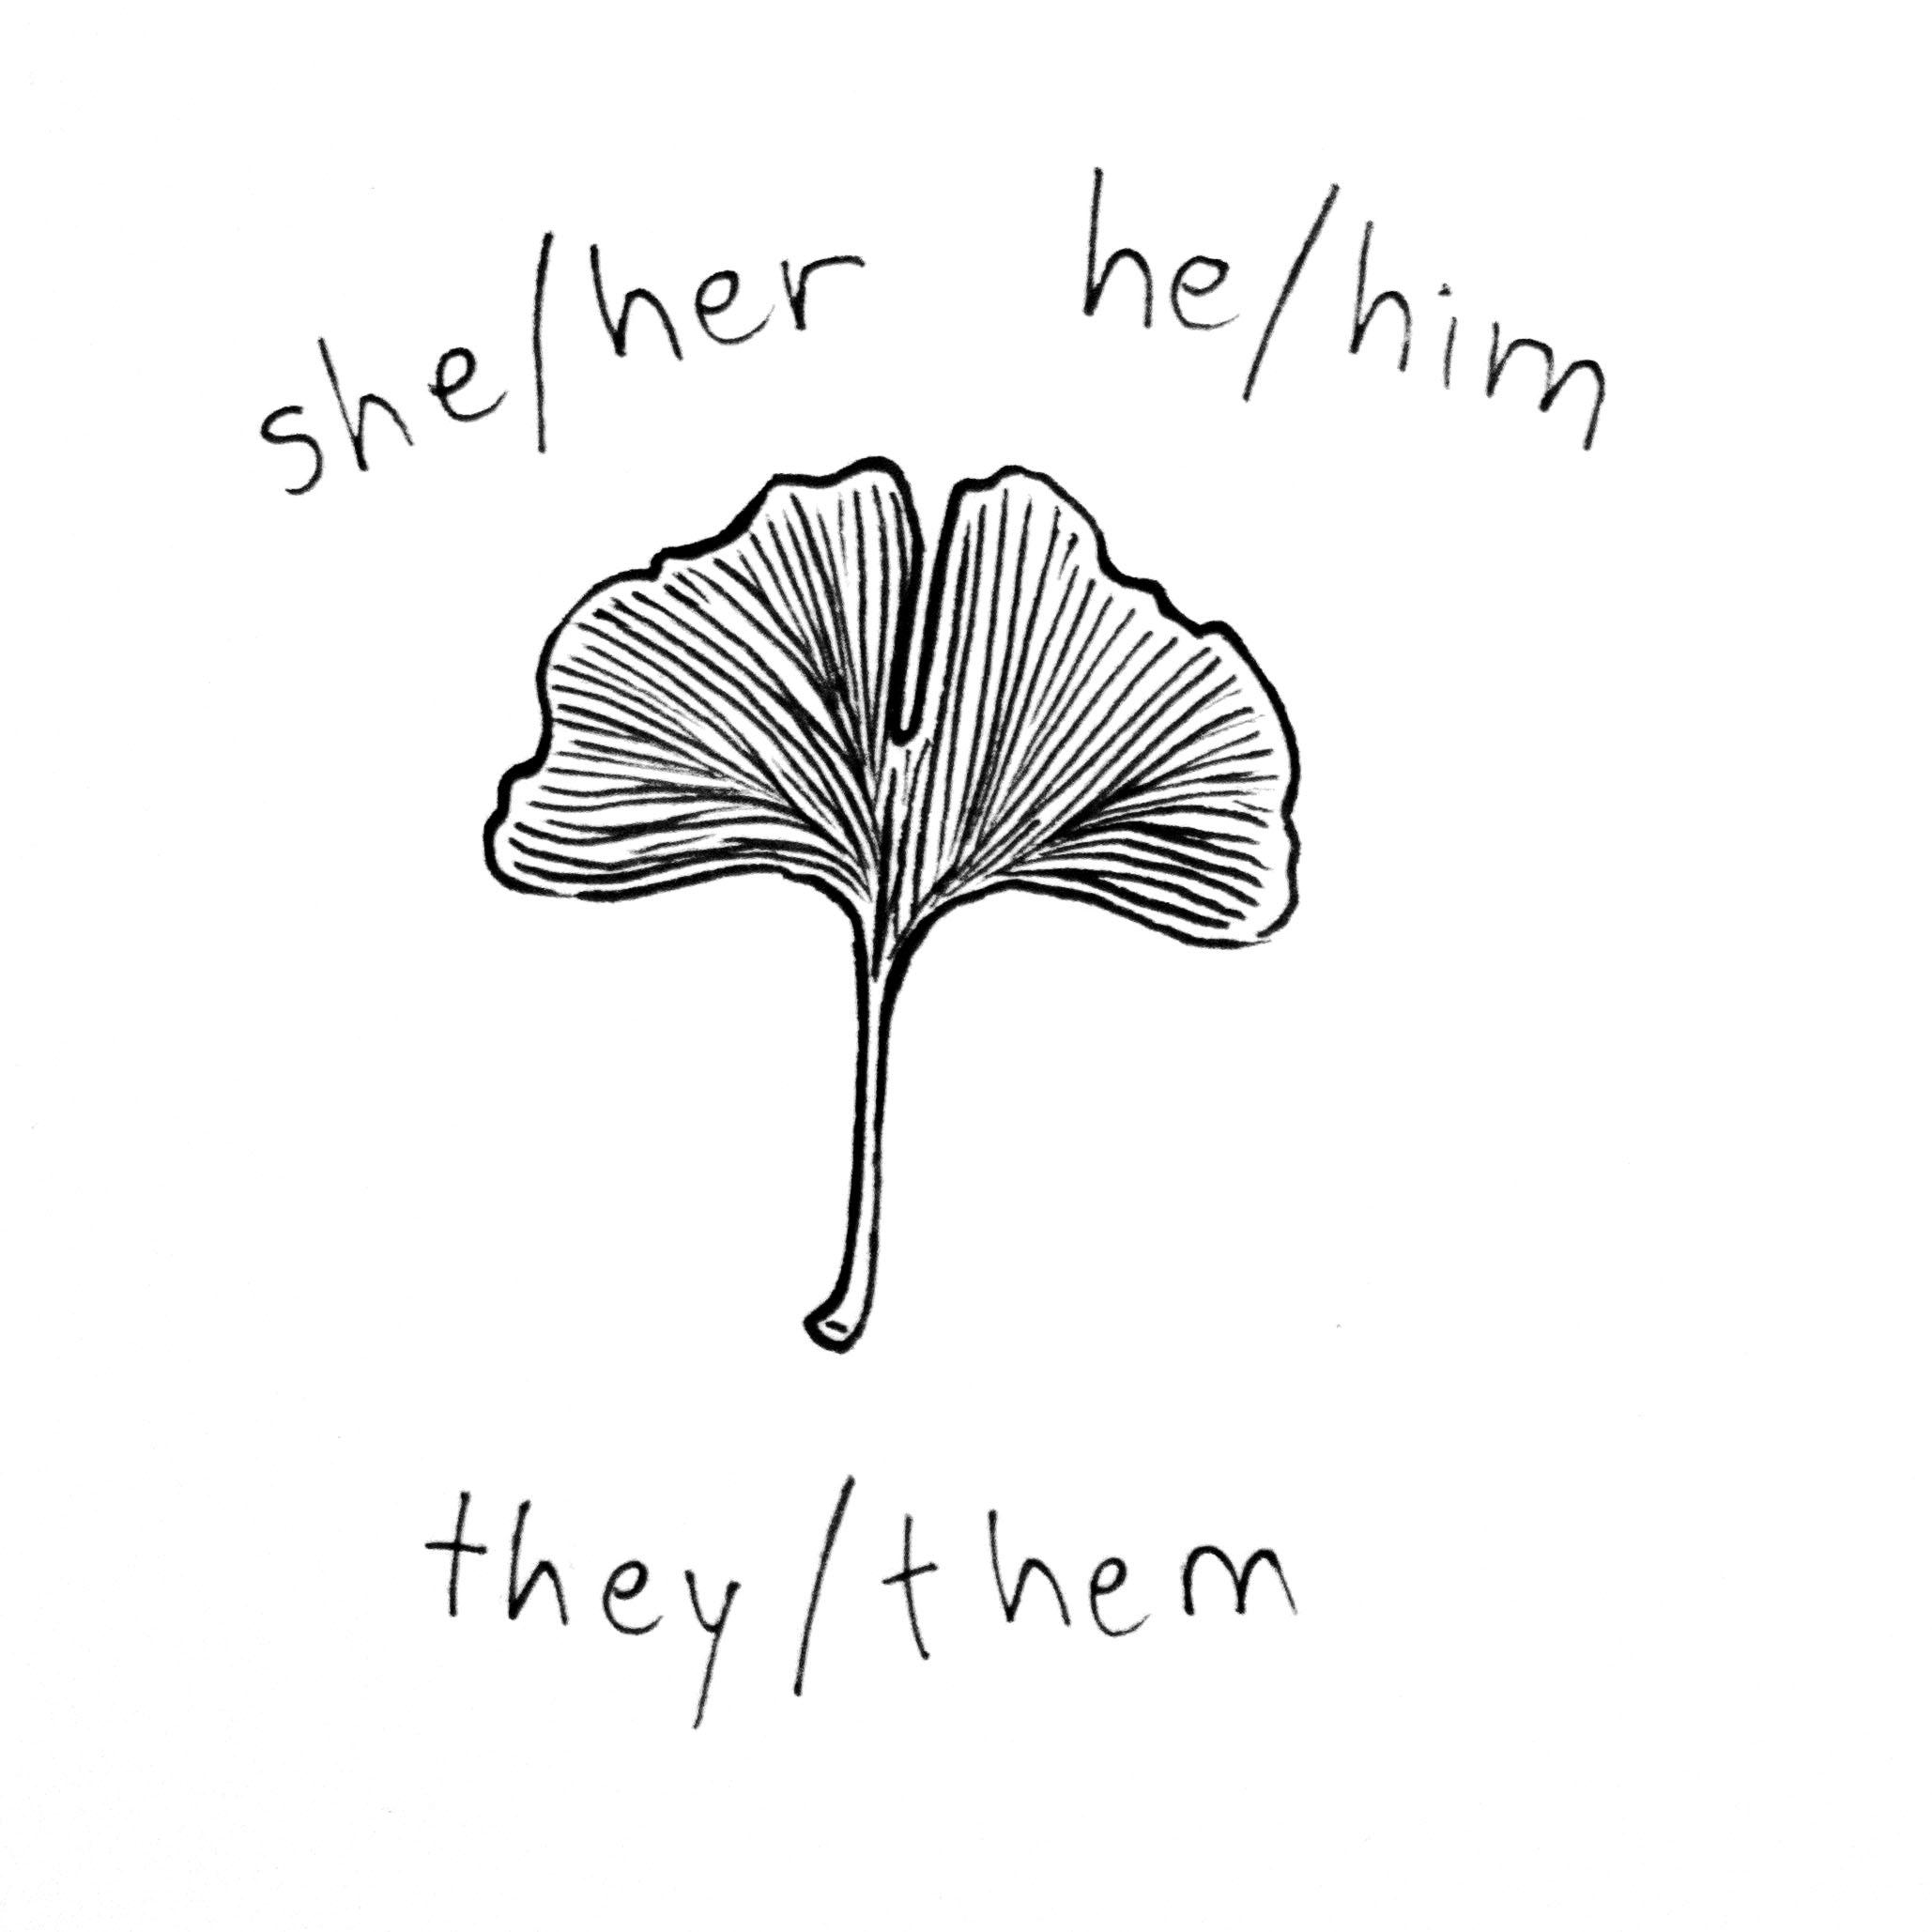 she_he_they.jpg